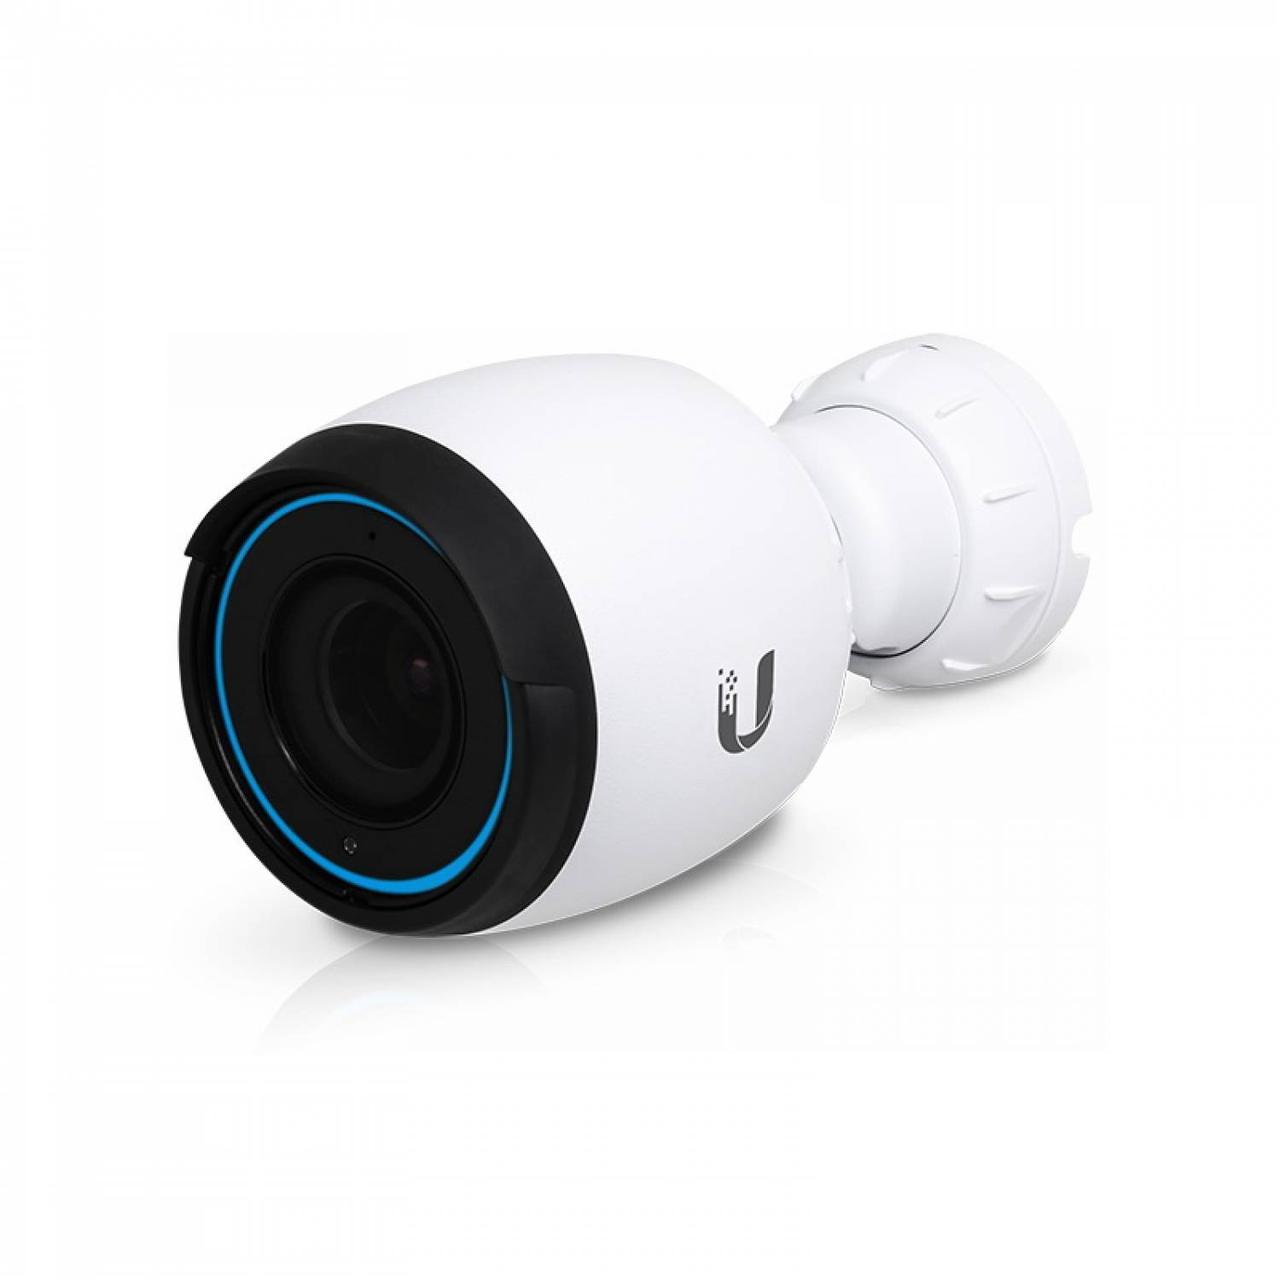 UniFi IP-камера Ubiquiti UniFi Video Camera G4 Pro